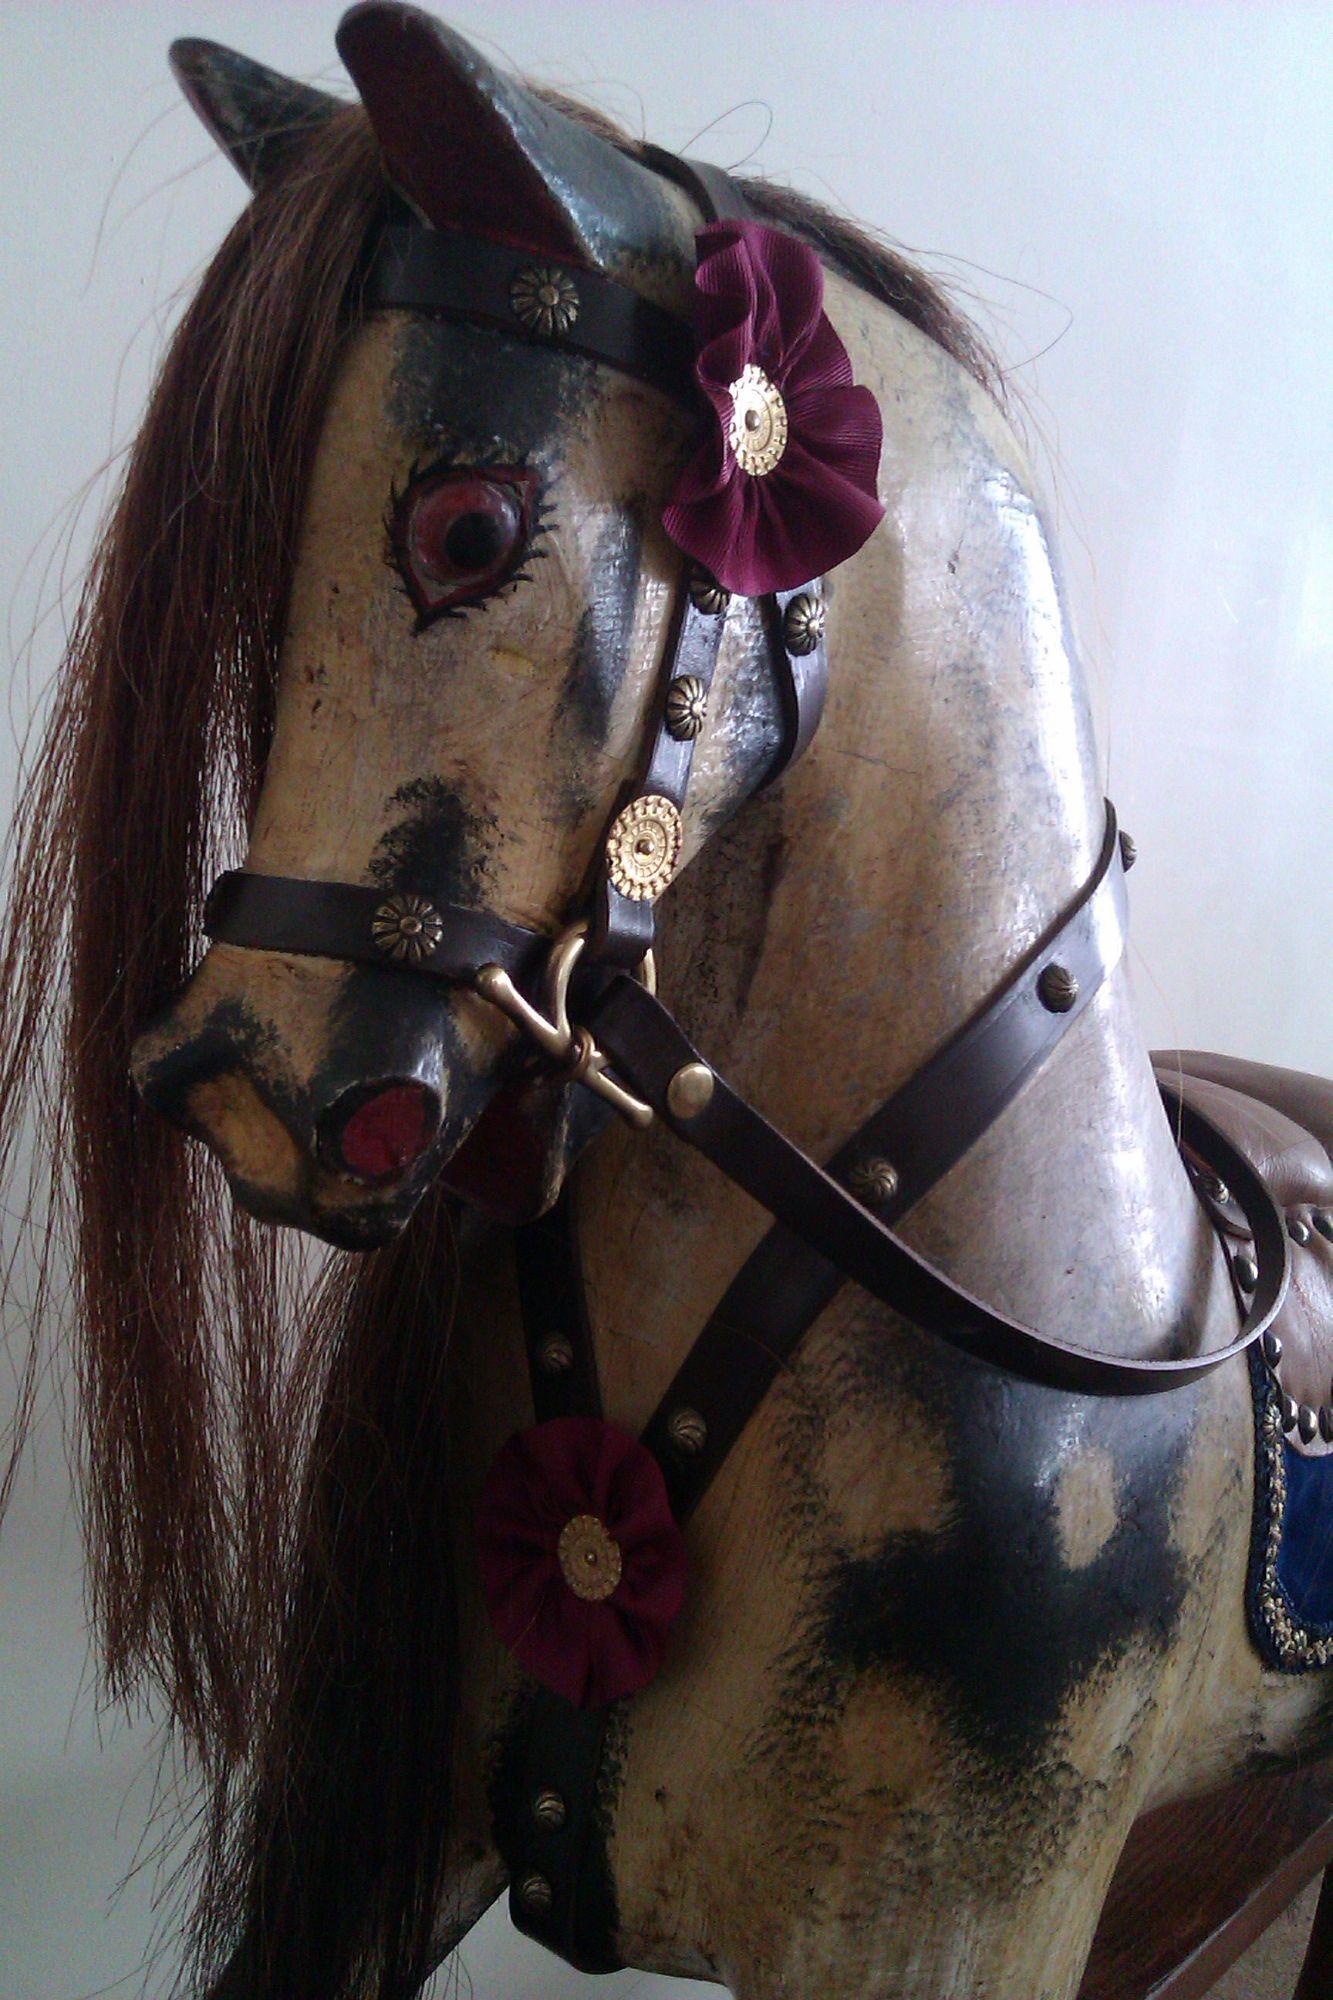 Sold - Antique rocking horse by Norton & Barker fully restored